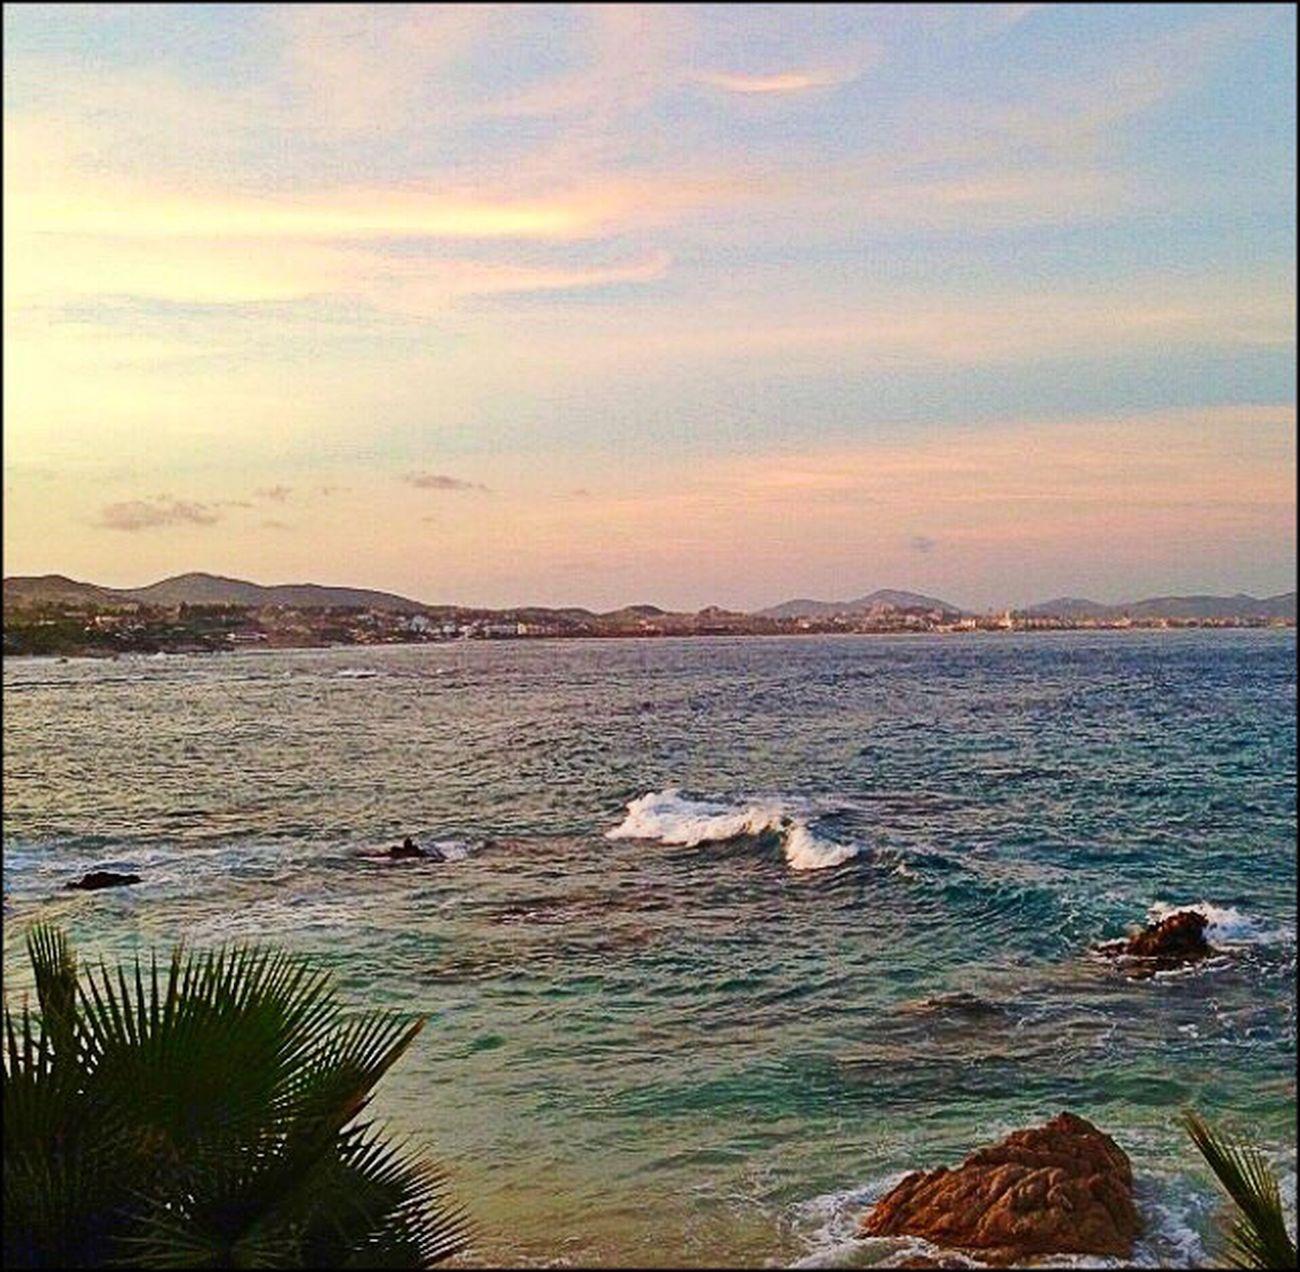 paisaje playa naturaleza conelamordemivida ♥♥ Sin Filtros Los Cabos Mexico Paraíso Taking Photos Enjoying Life Lovely Day Lovely Weather